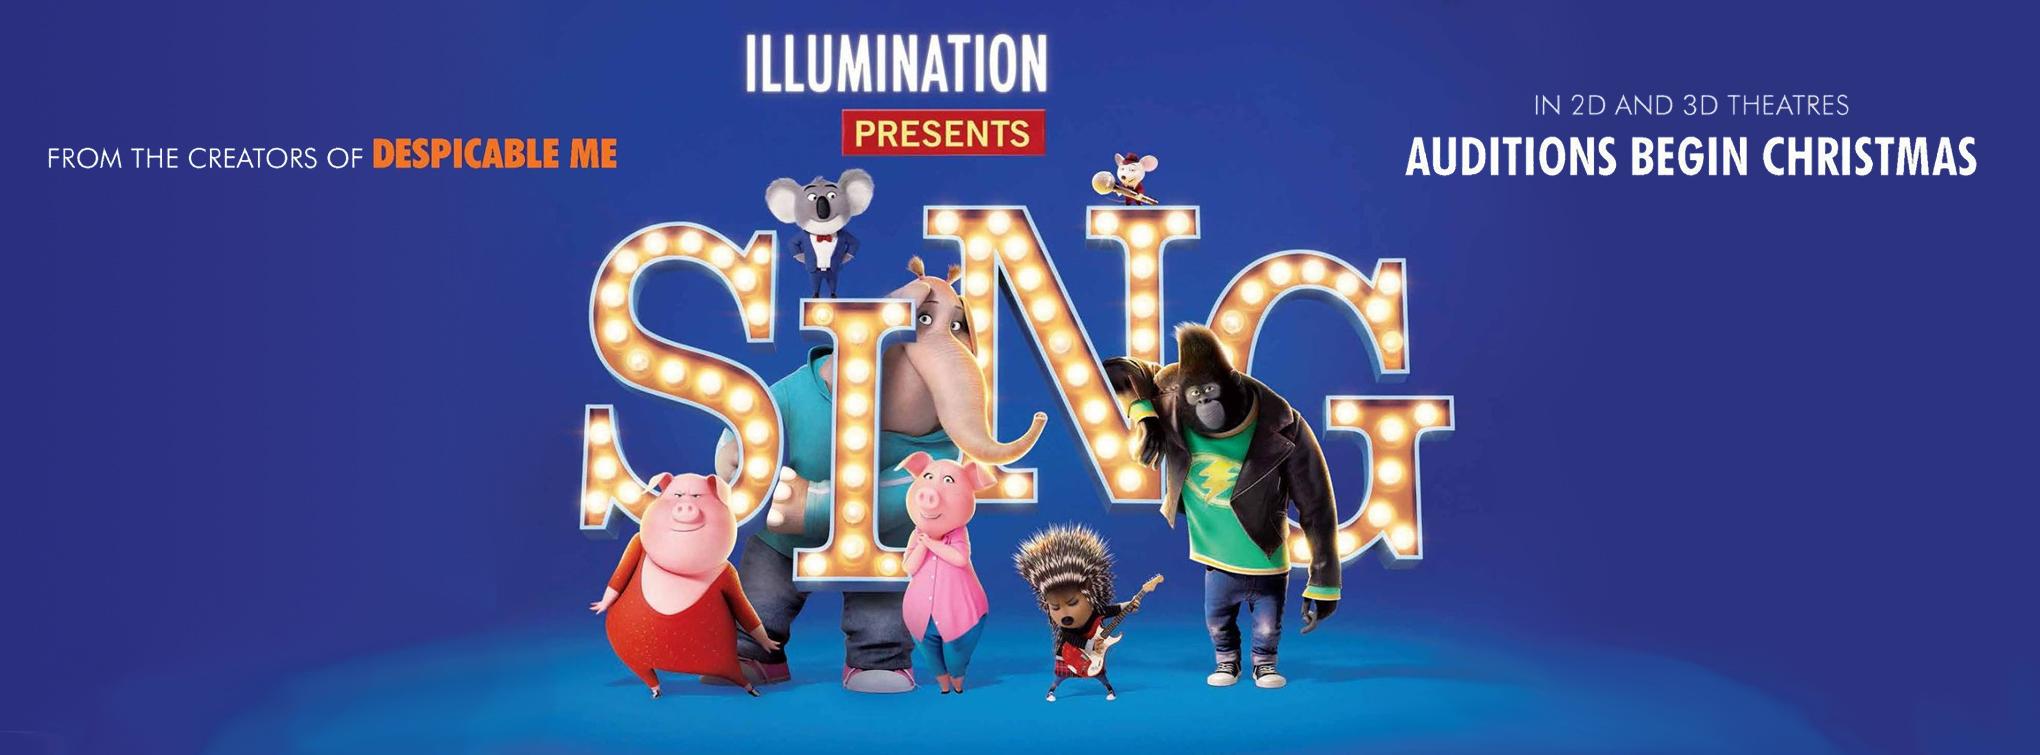 Sing, opens December 22!